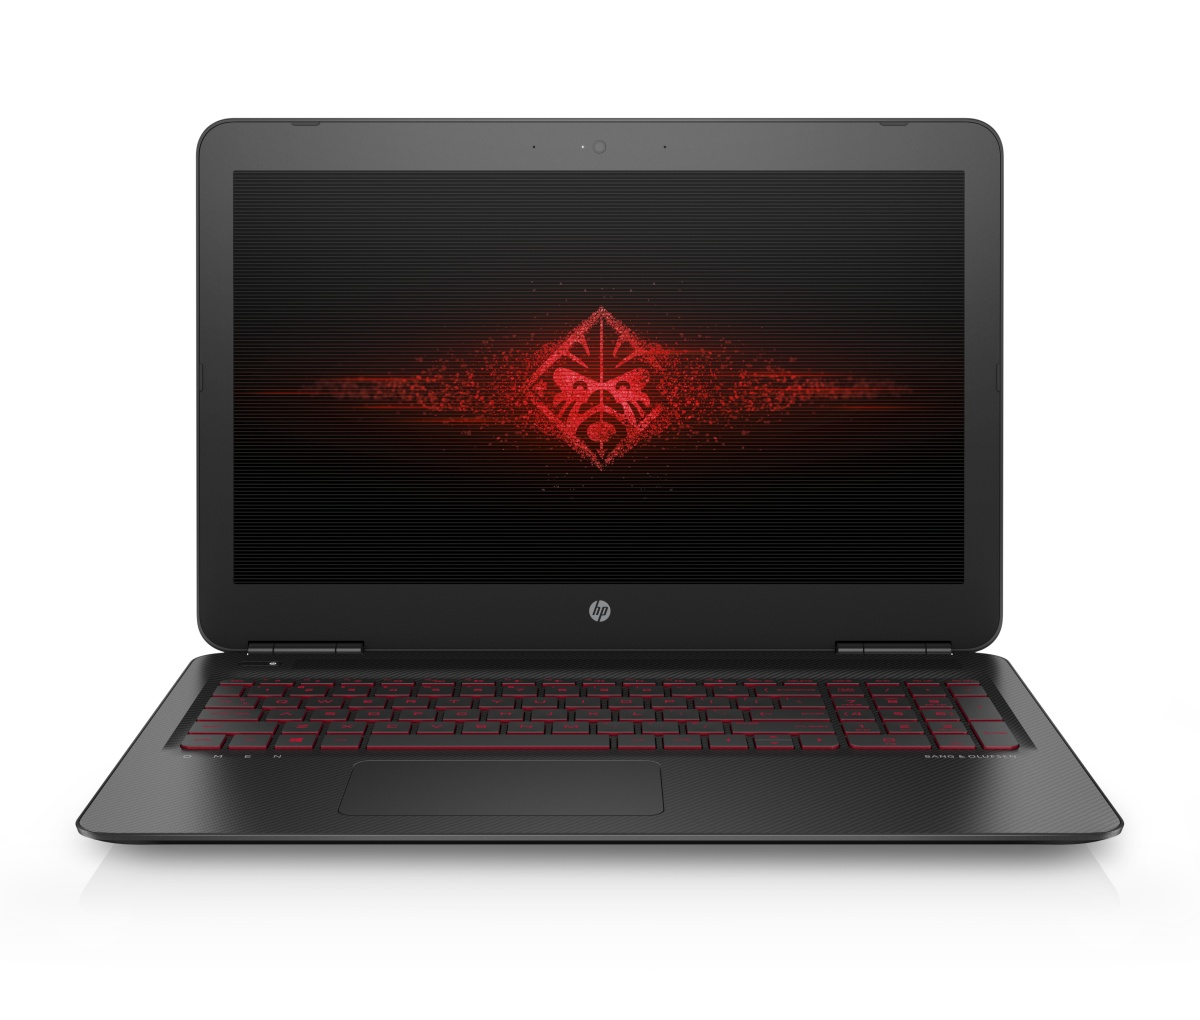 "HP Omen 15-ax201nc/Intel i7-7700HQ/16GB/256 GB SSD + 1TB/ GTX 1050 TI 4GB/15,6"" FHD/Win 10/tmavá"